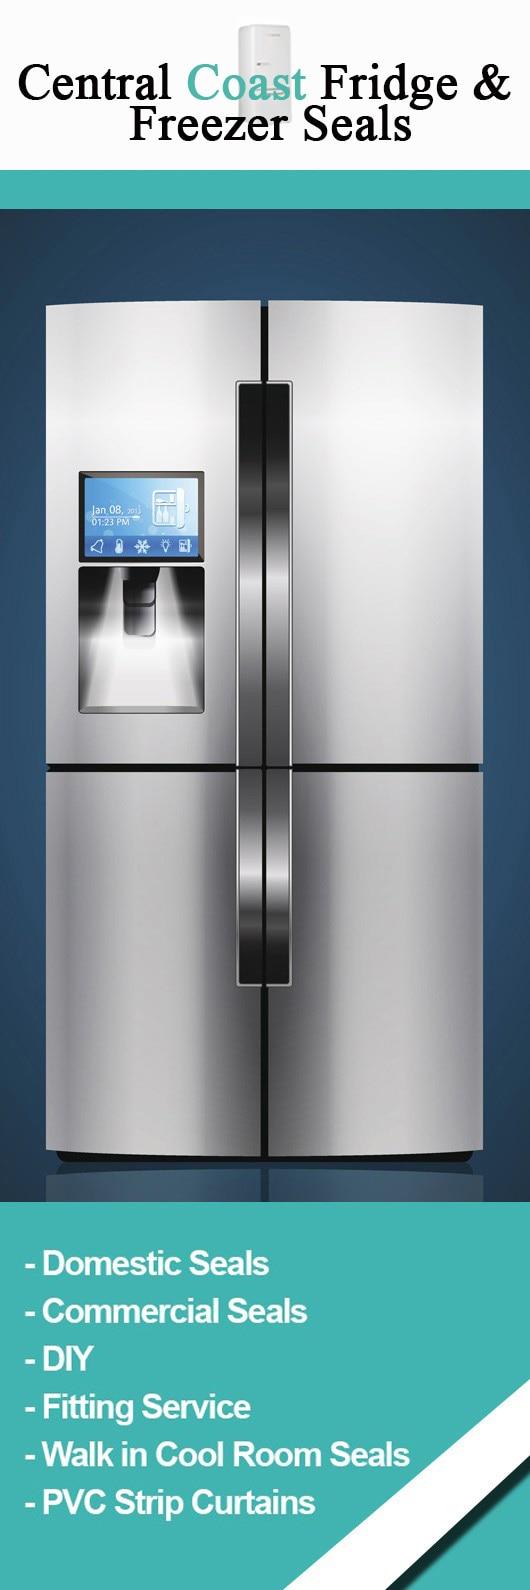 Uncategorized Kitchen Appliances Newcastle aeg appliances winning kitchen newcastle central coast fridge freezer seals repairs gosford newcastle